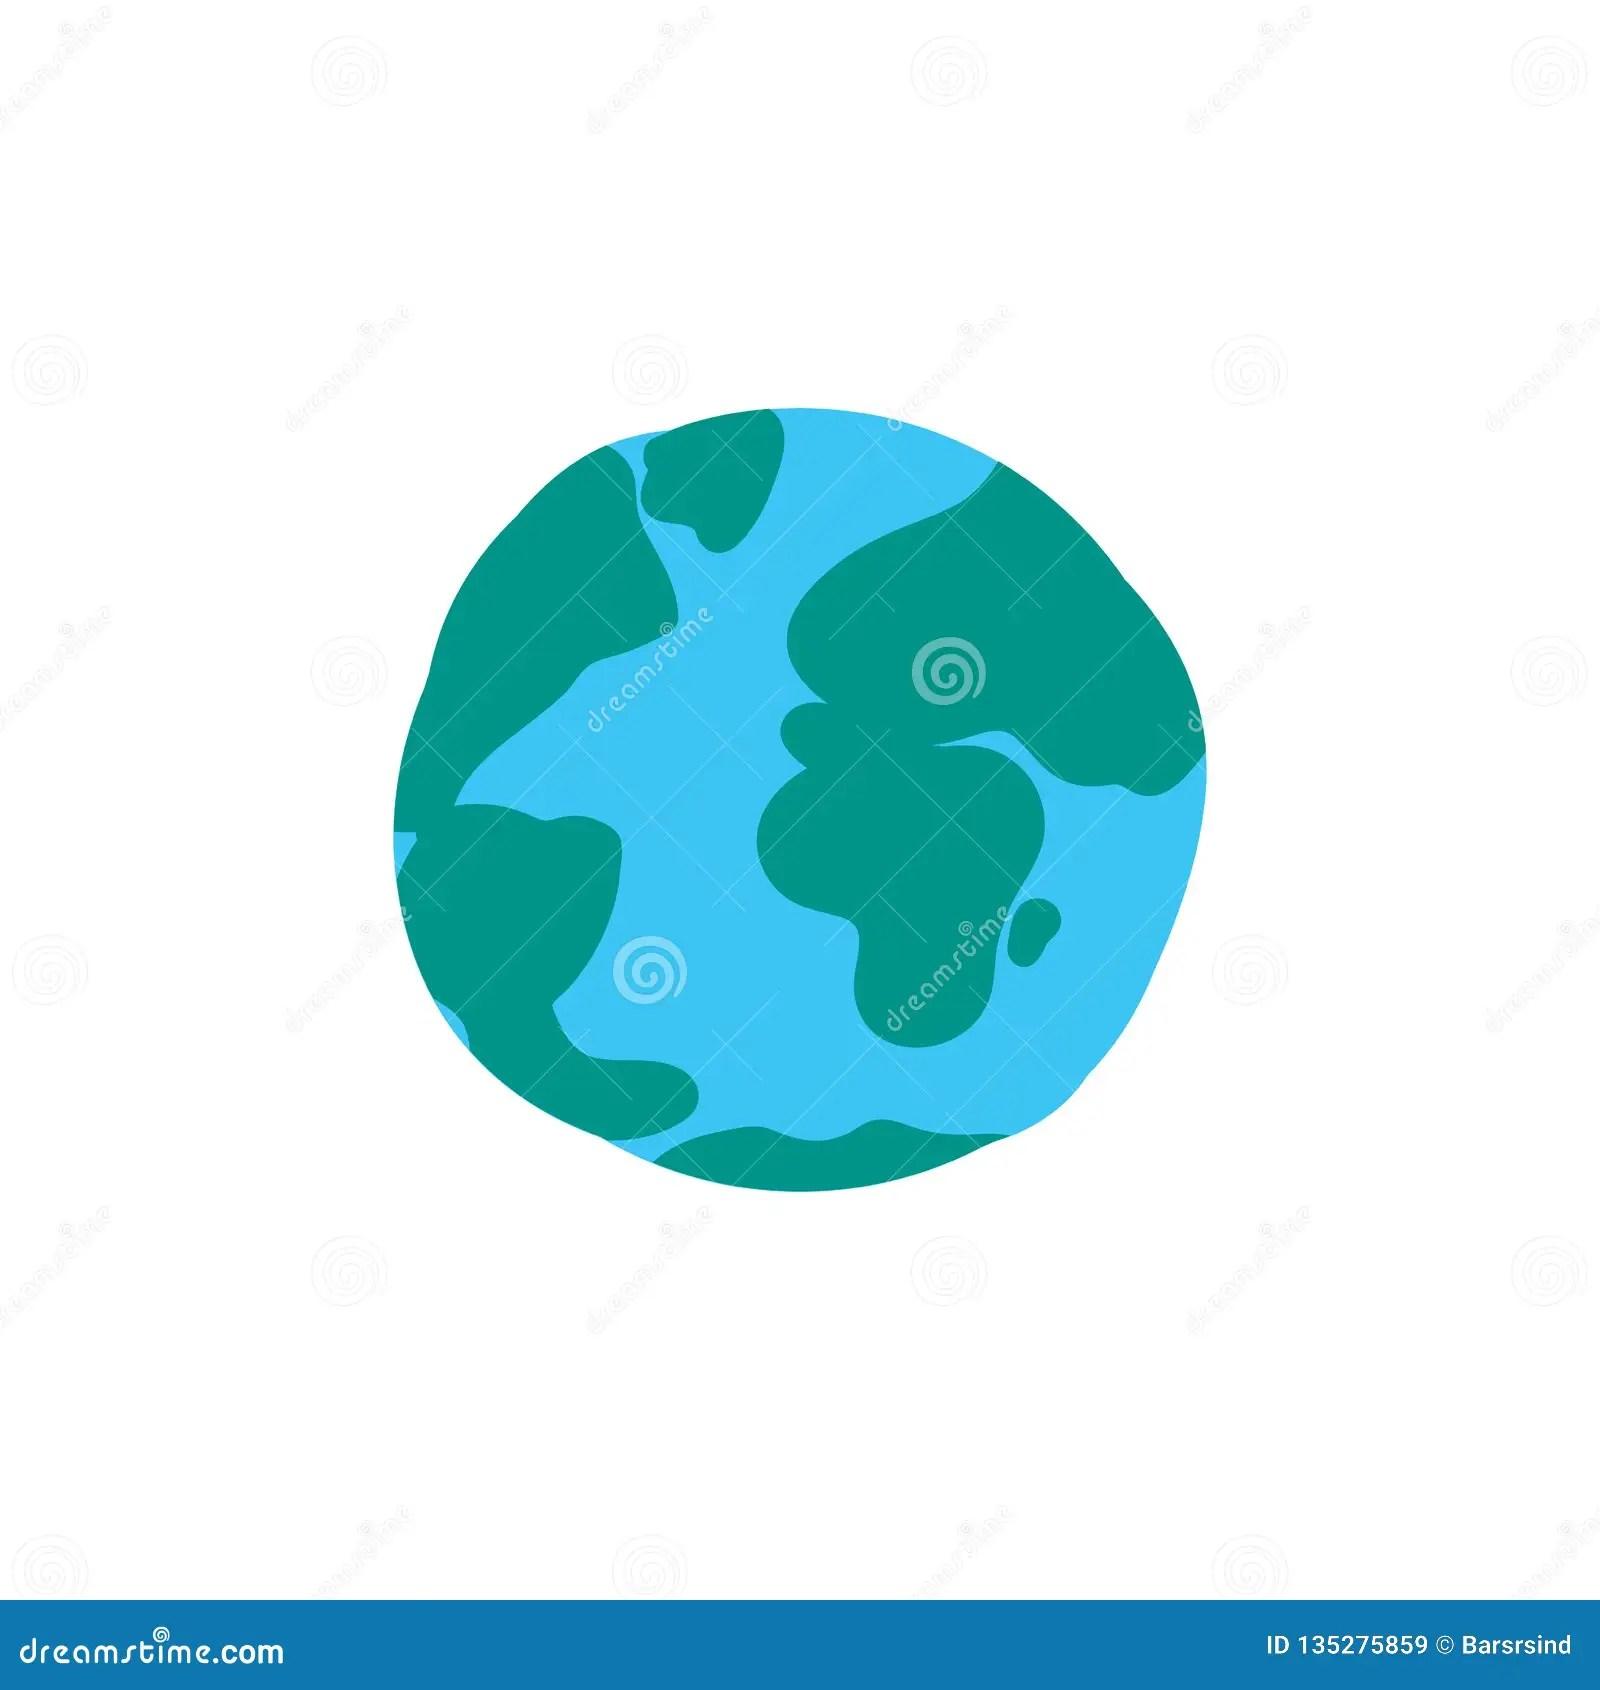 hight resolution of planet globe flat color illustration earth cartoon clipart world sphere hand drawn design element